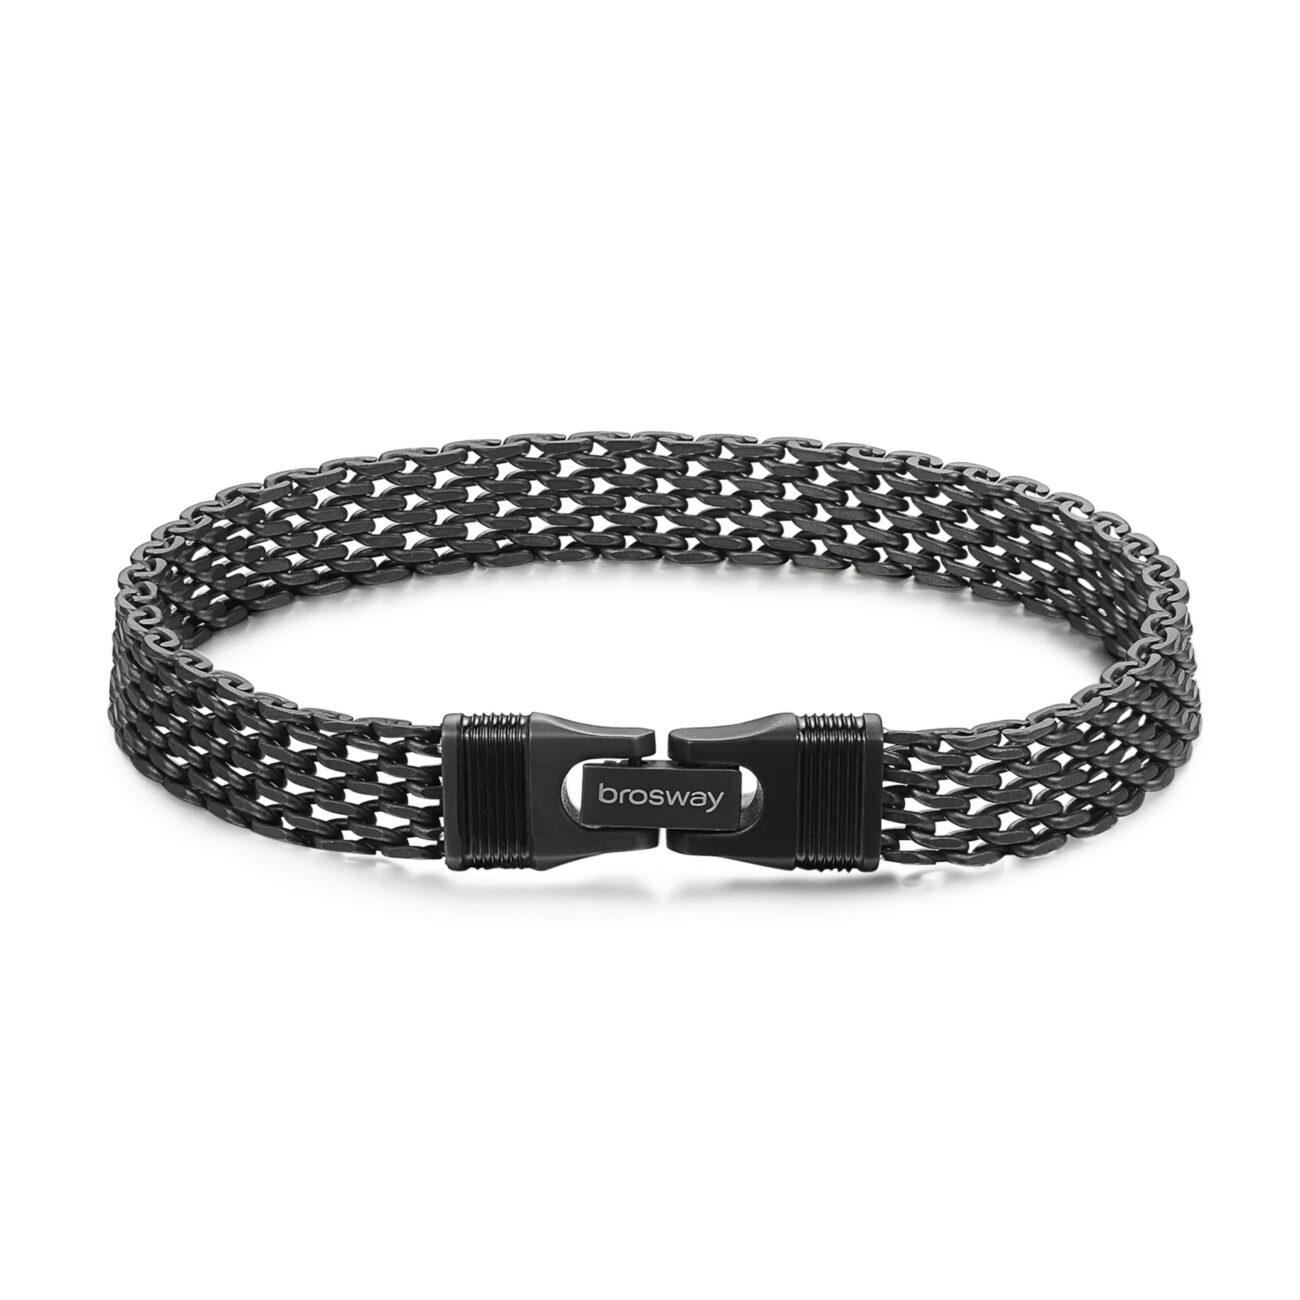 316L stainless steel bracelet with matt gunmetal and black pvd.